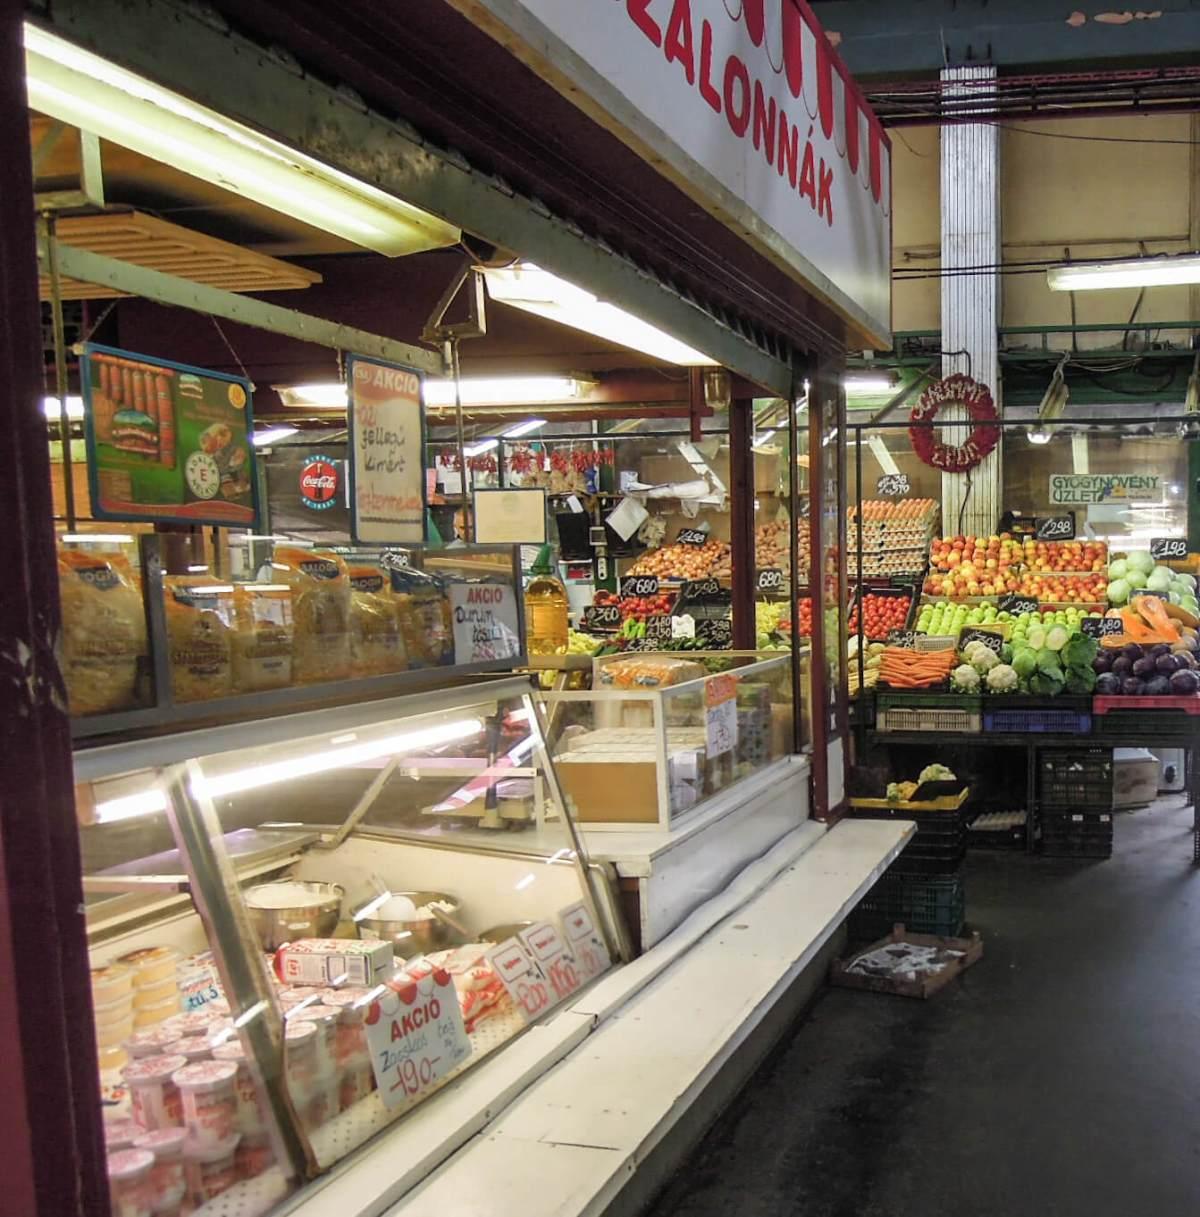 Budapest-III-Óbuda-piac-vásárcsarnok-Békásmegyer-3.jpg